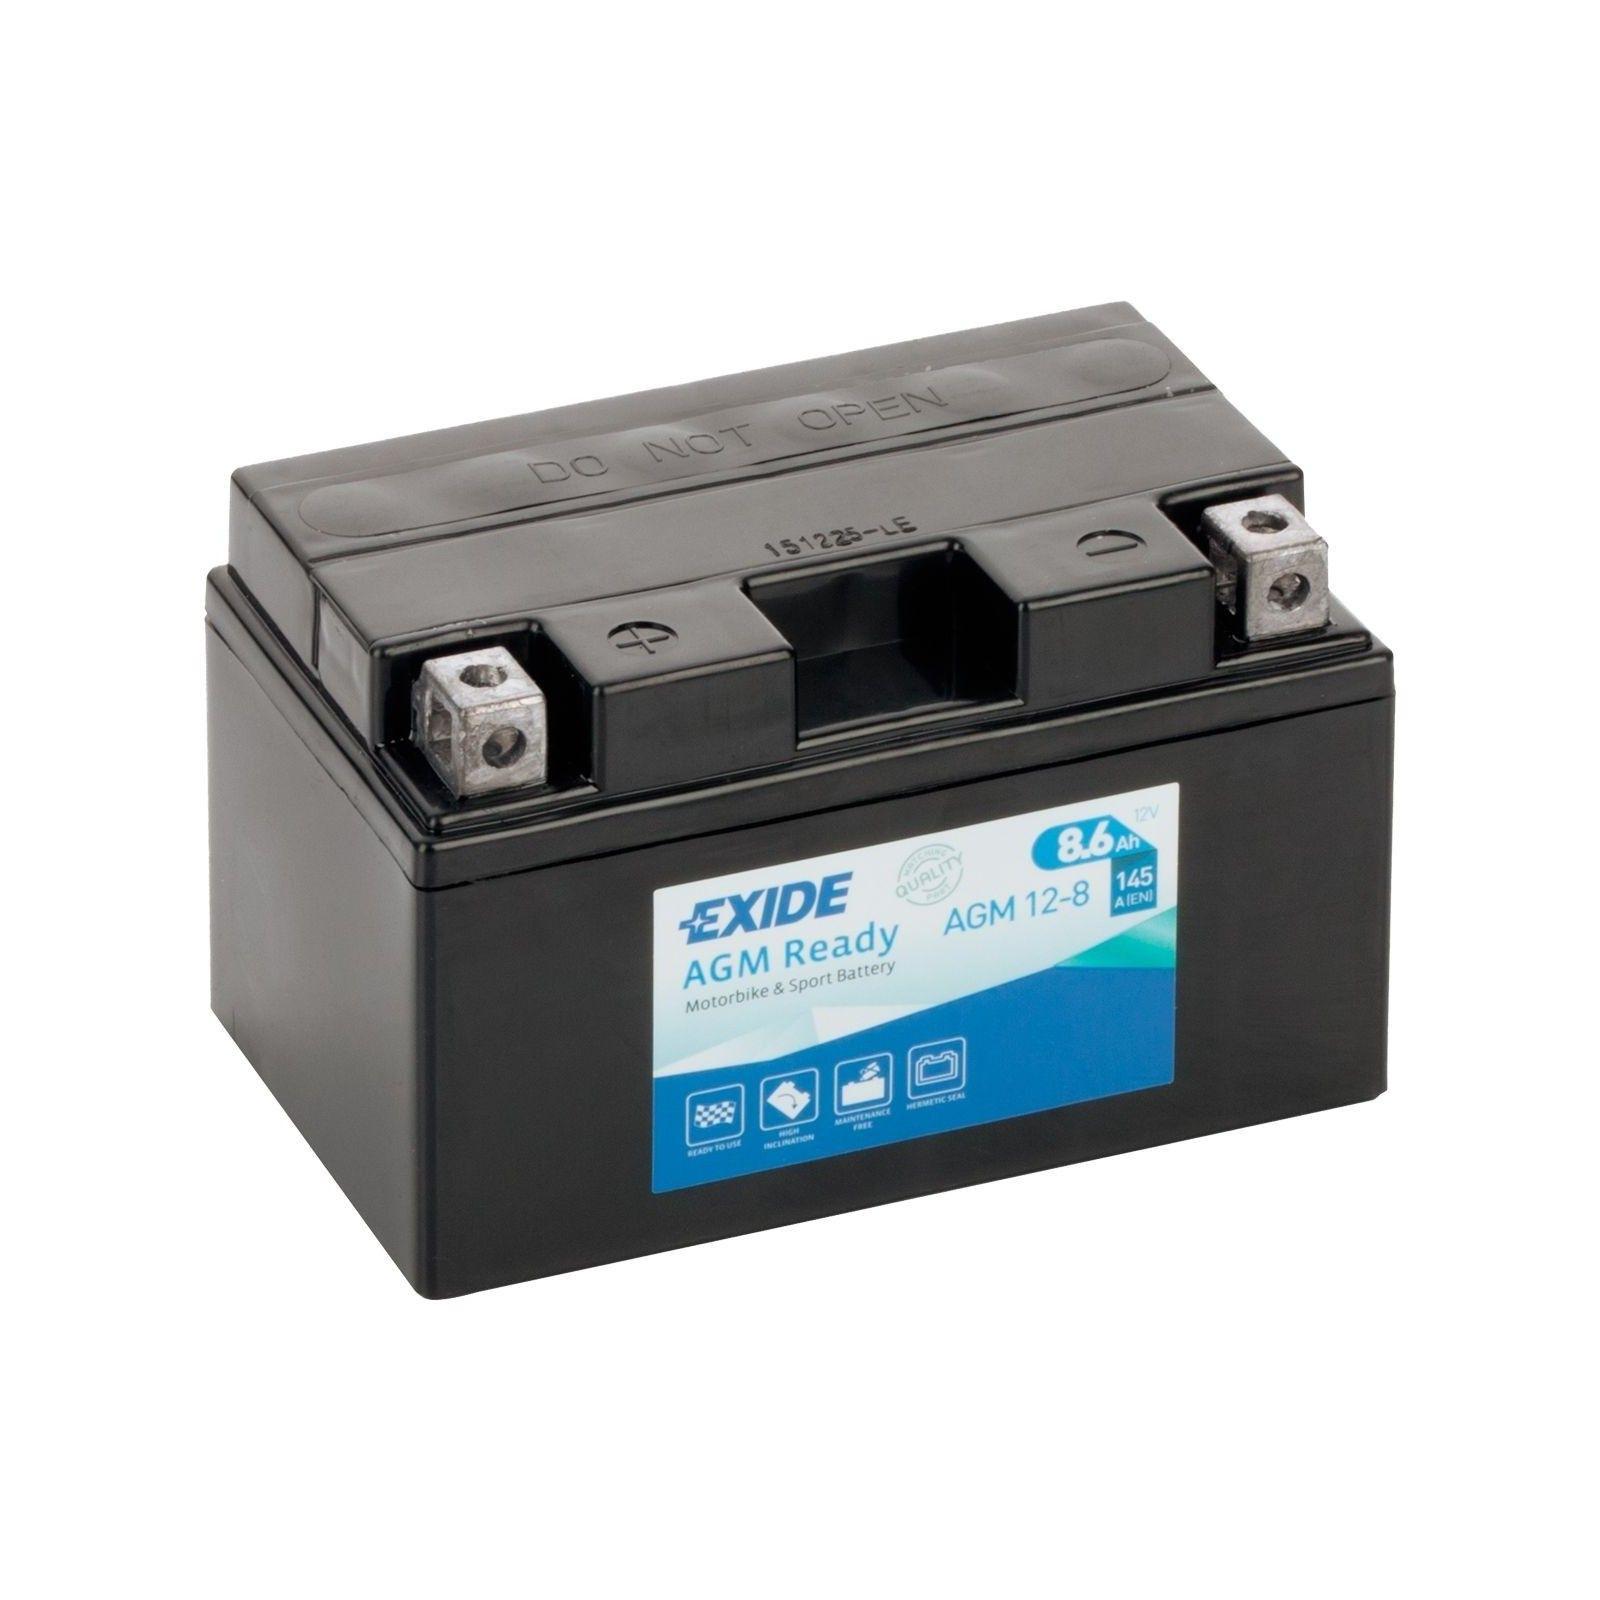 Batería Exide AGM12-8 8,6Ah 145A 12V Bike 12V Agm Ready EXIDE - 1